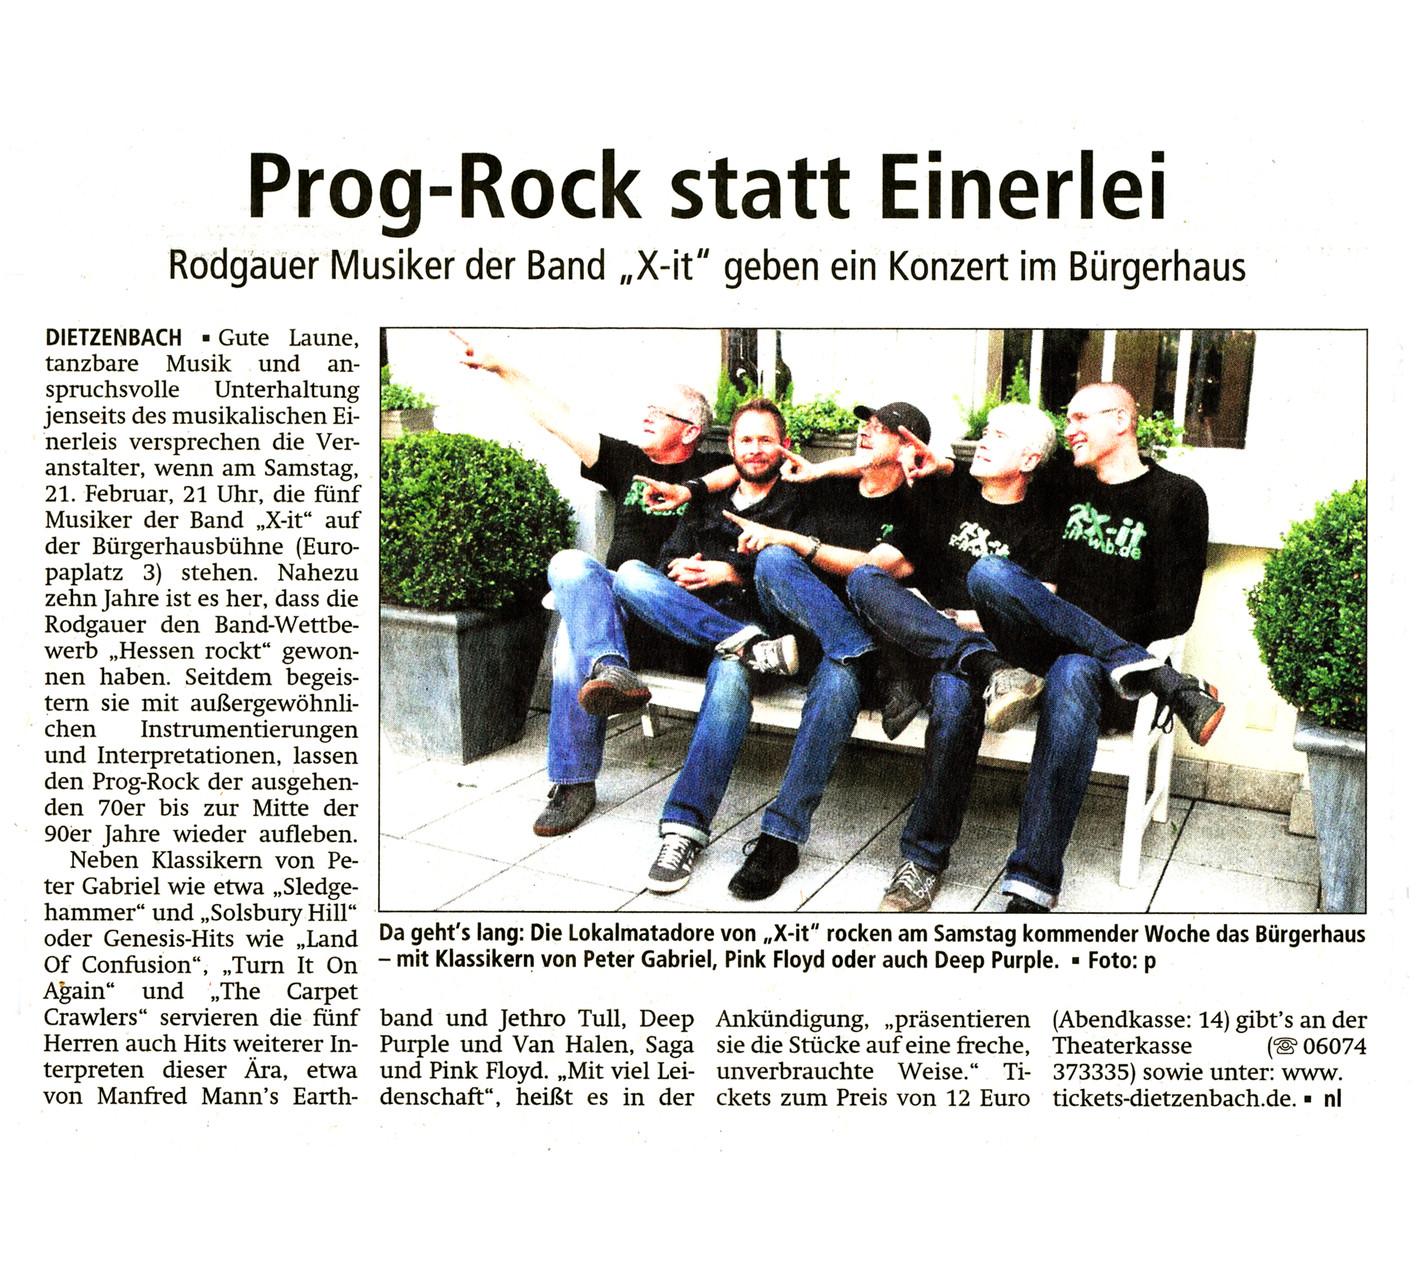 Offenbach Post, 14. Februar 2015